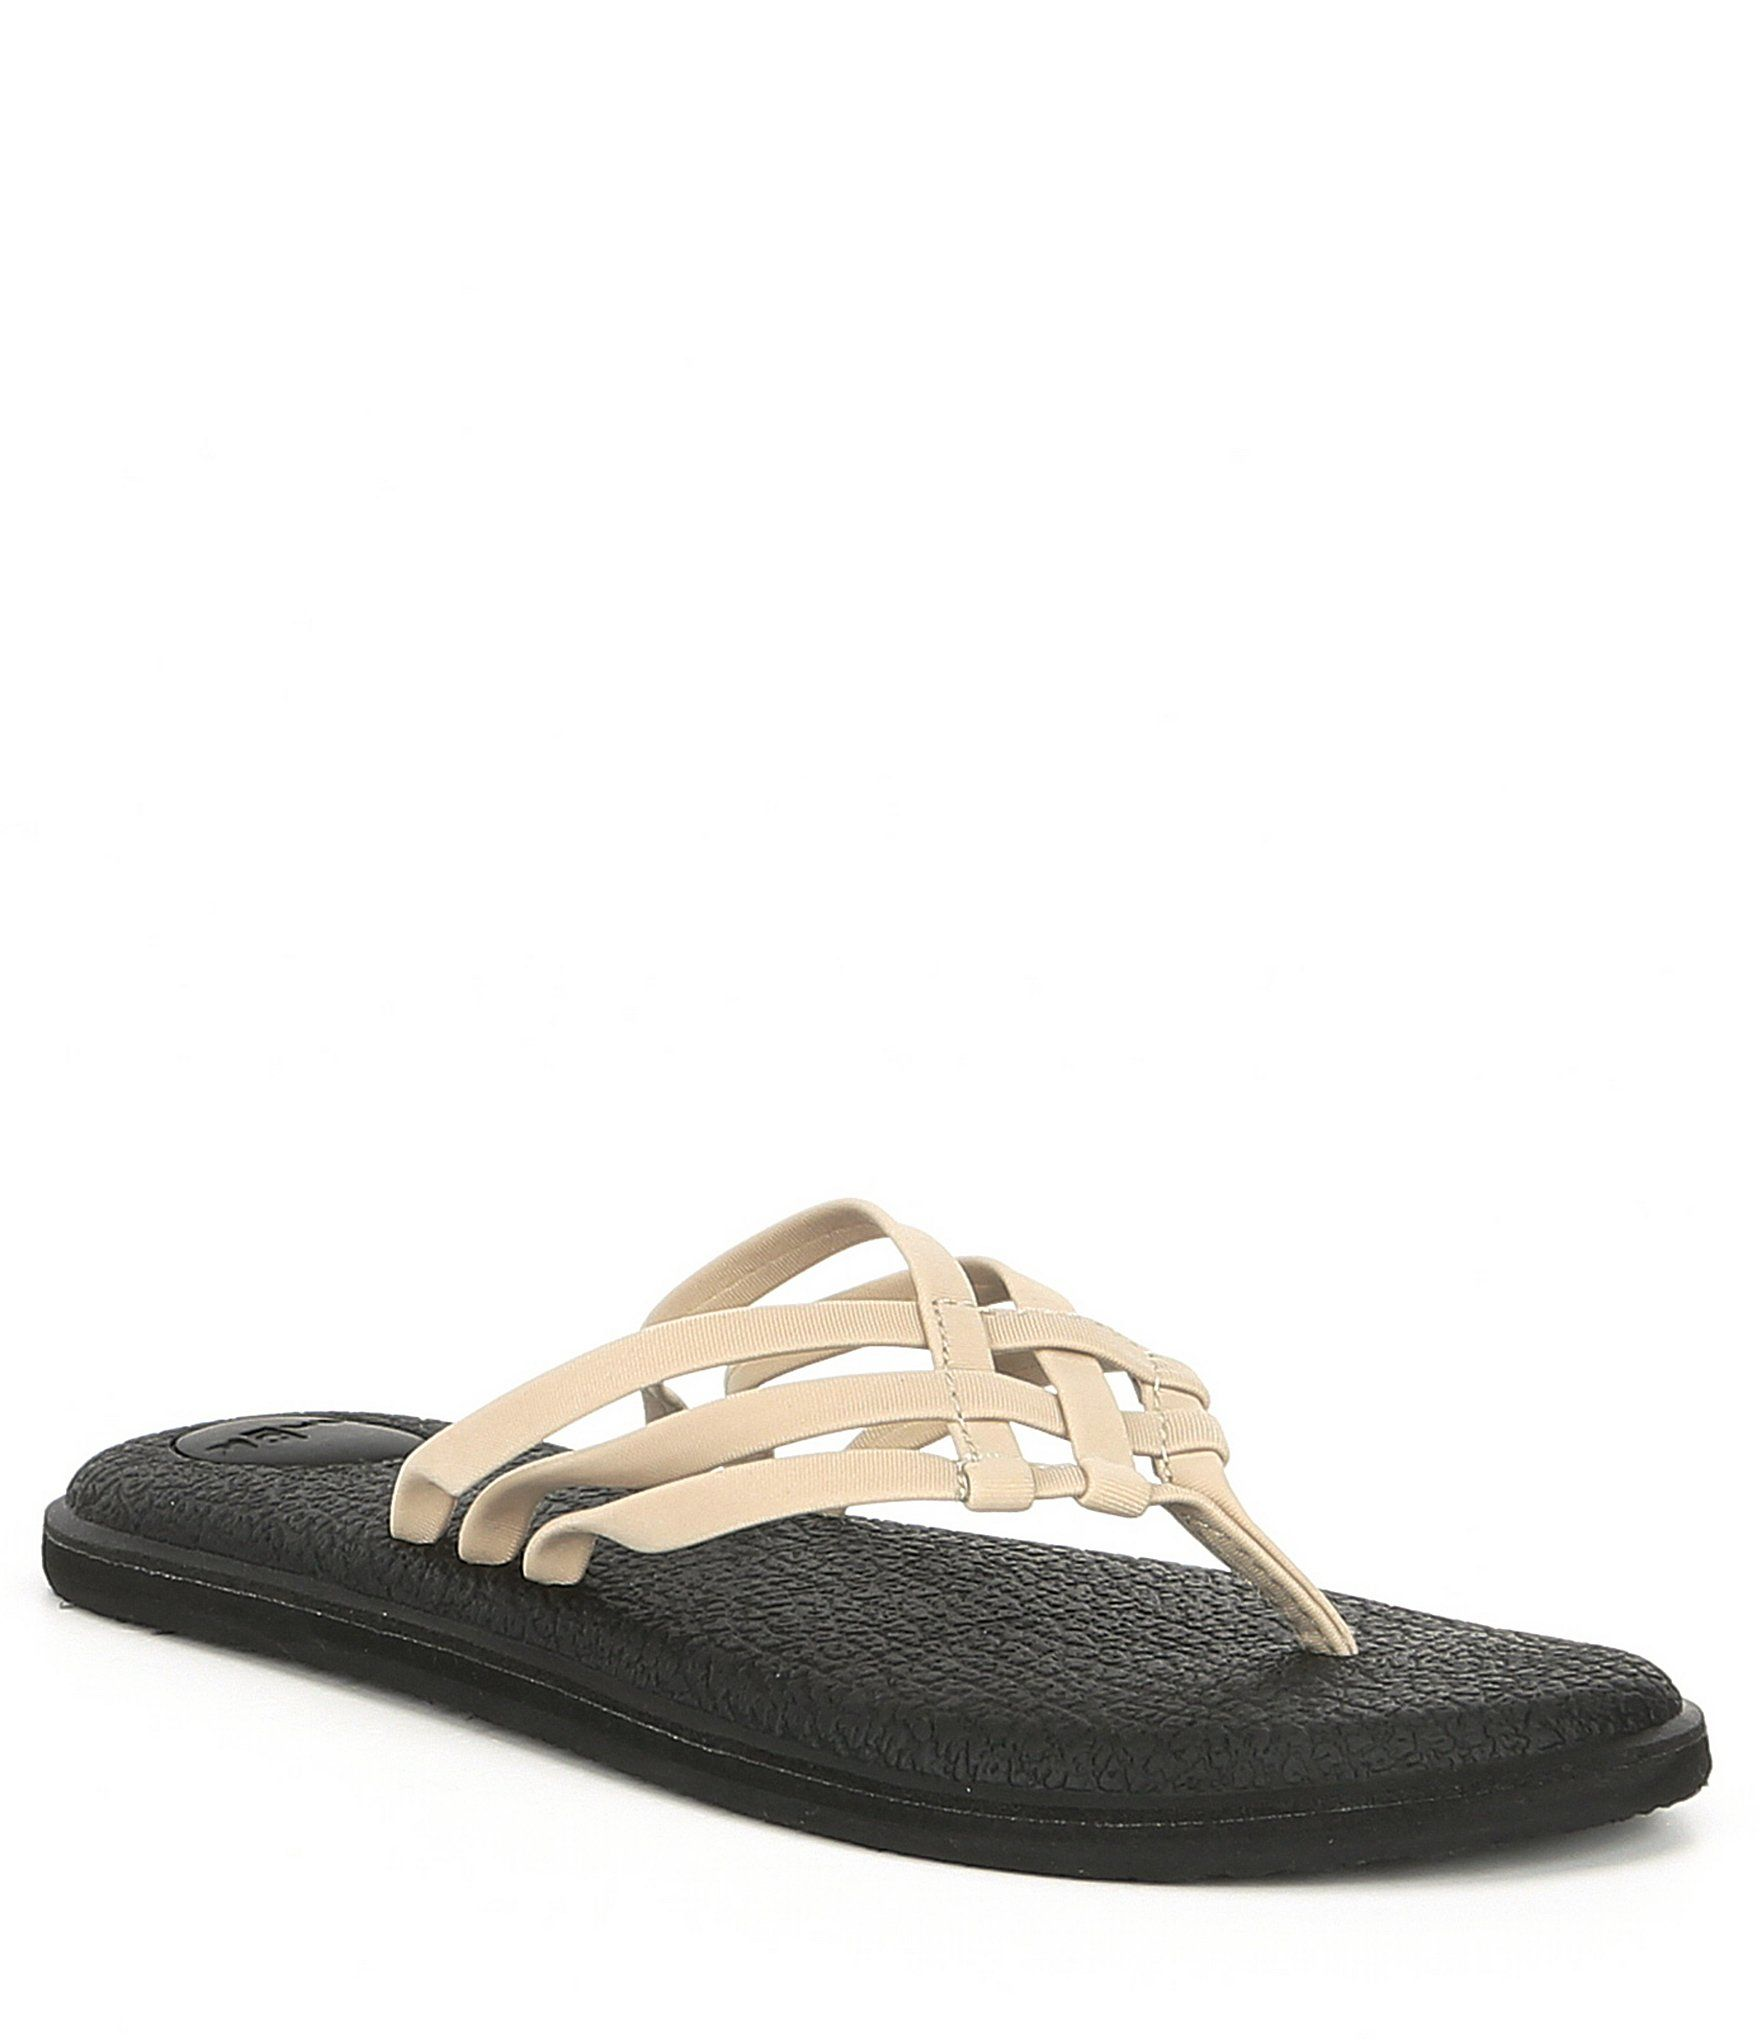 Sanuk Women's Yoga Salty Flip Flop Sandals – Black 9M